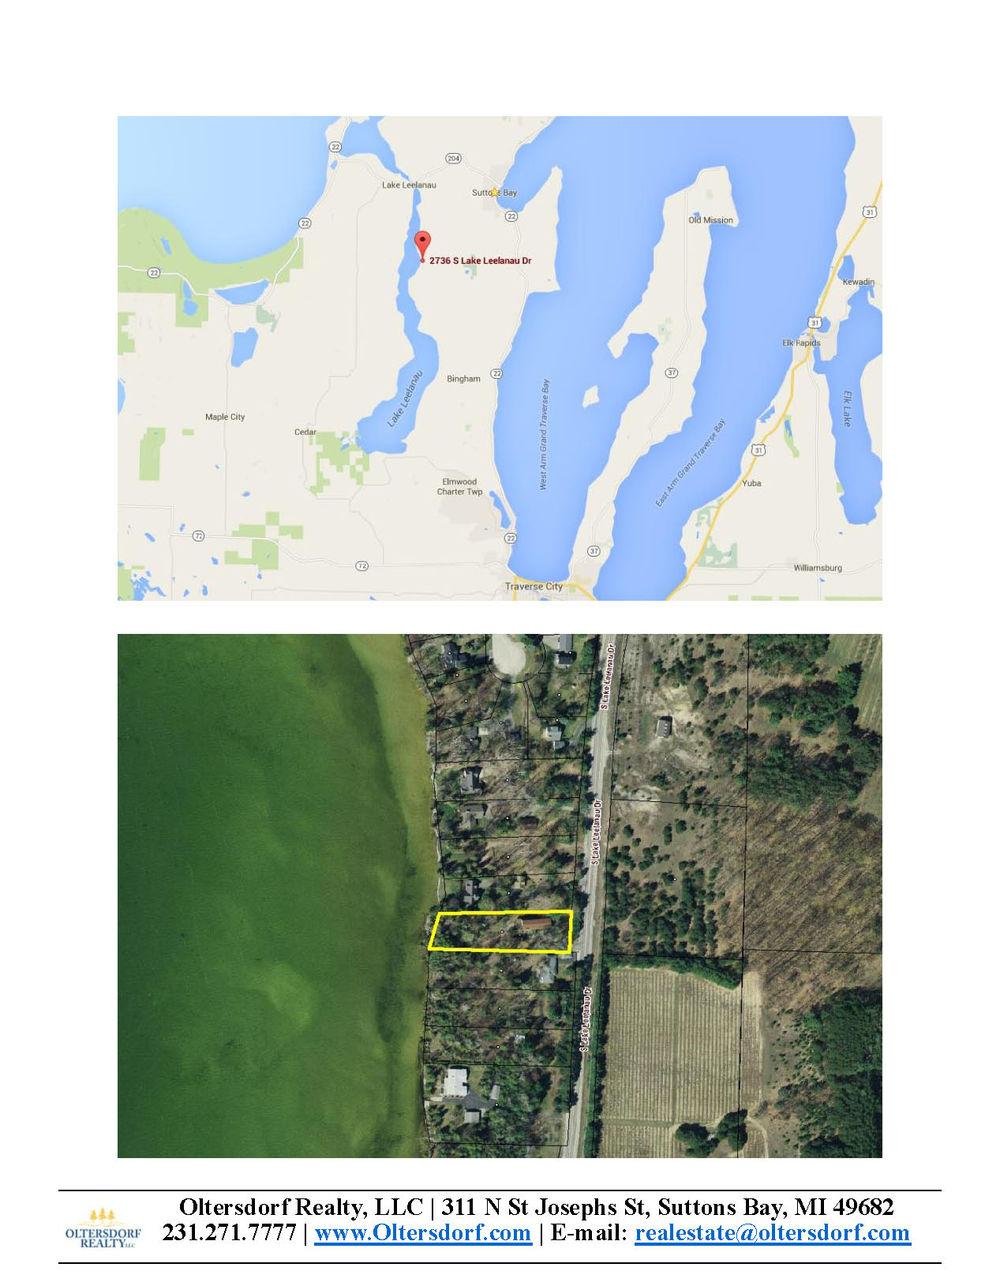 2736 S Lake Leelanau Dr, South Lake Leelanau Waterfront for sale by Oltersdorf Realty LLC - Marketing Packet (9).jpg